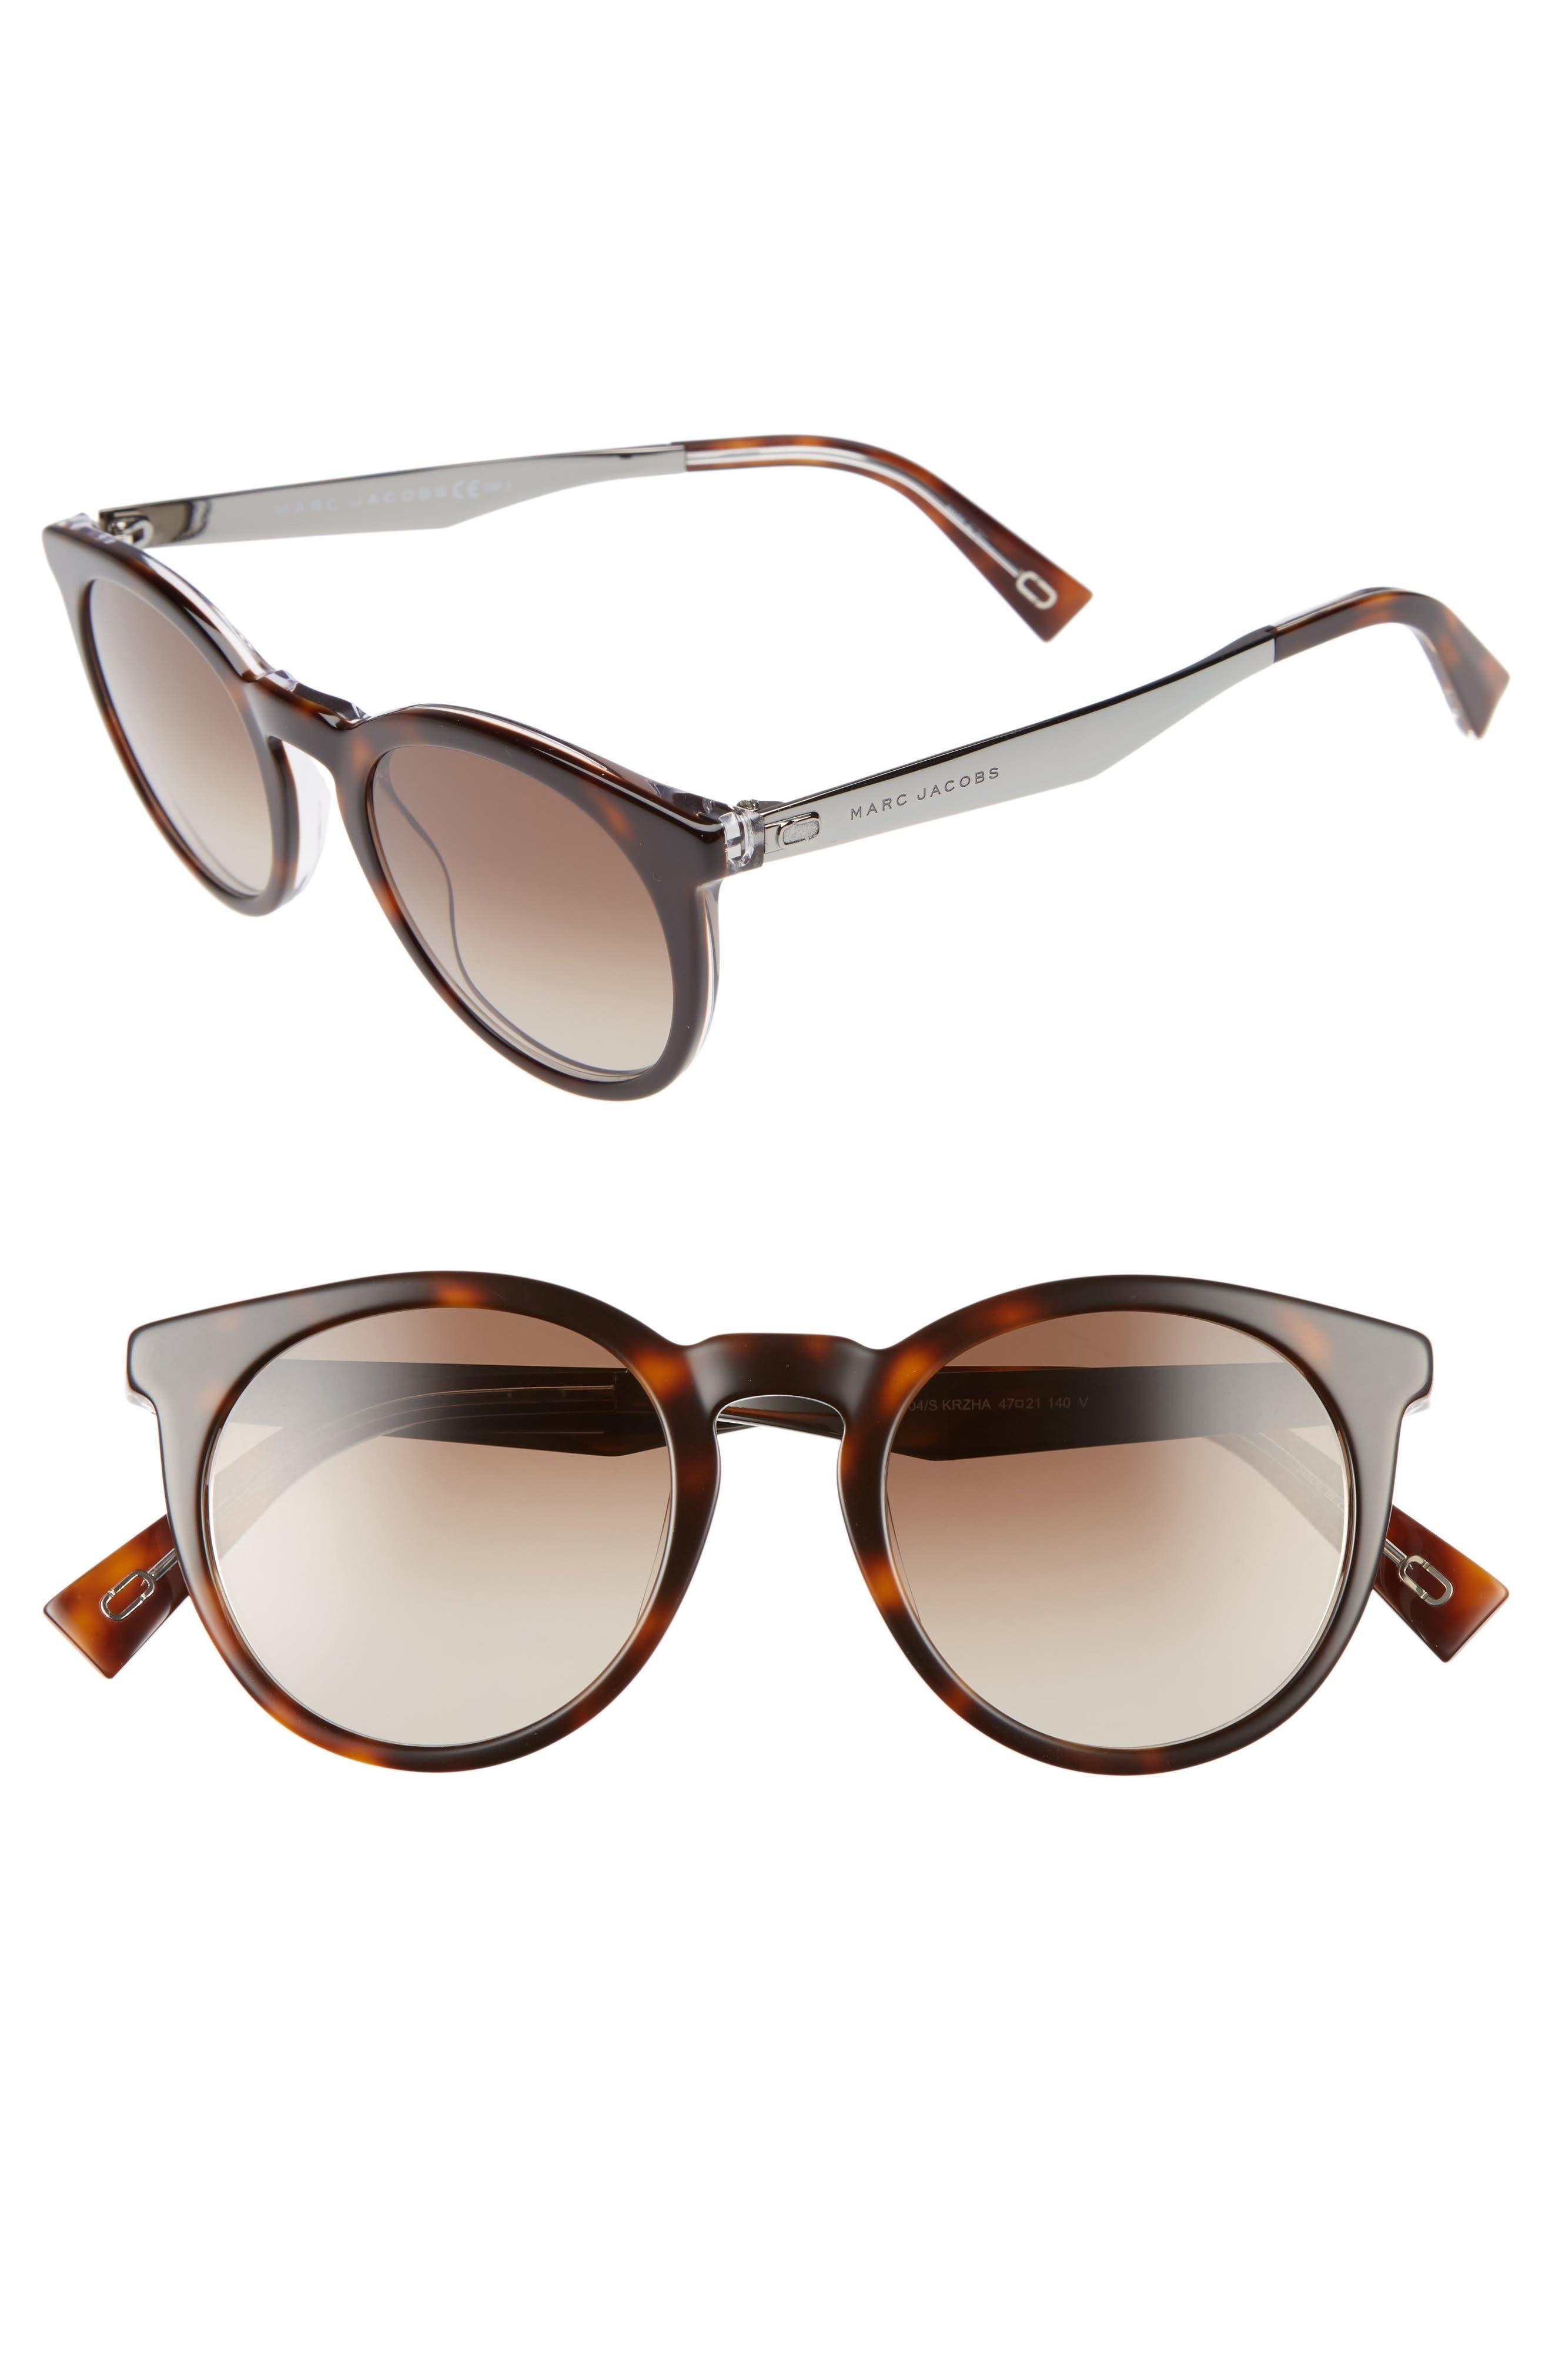 47mm Keyhole Sunglasses,                         Main,                         color, Havana Crystal